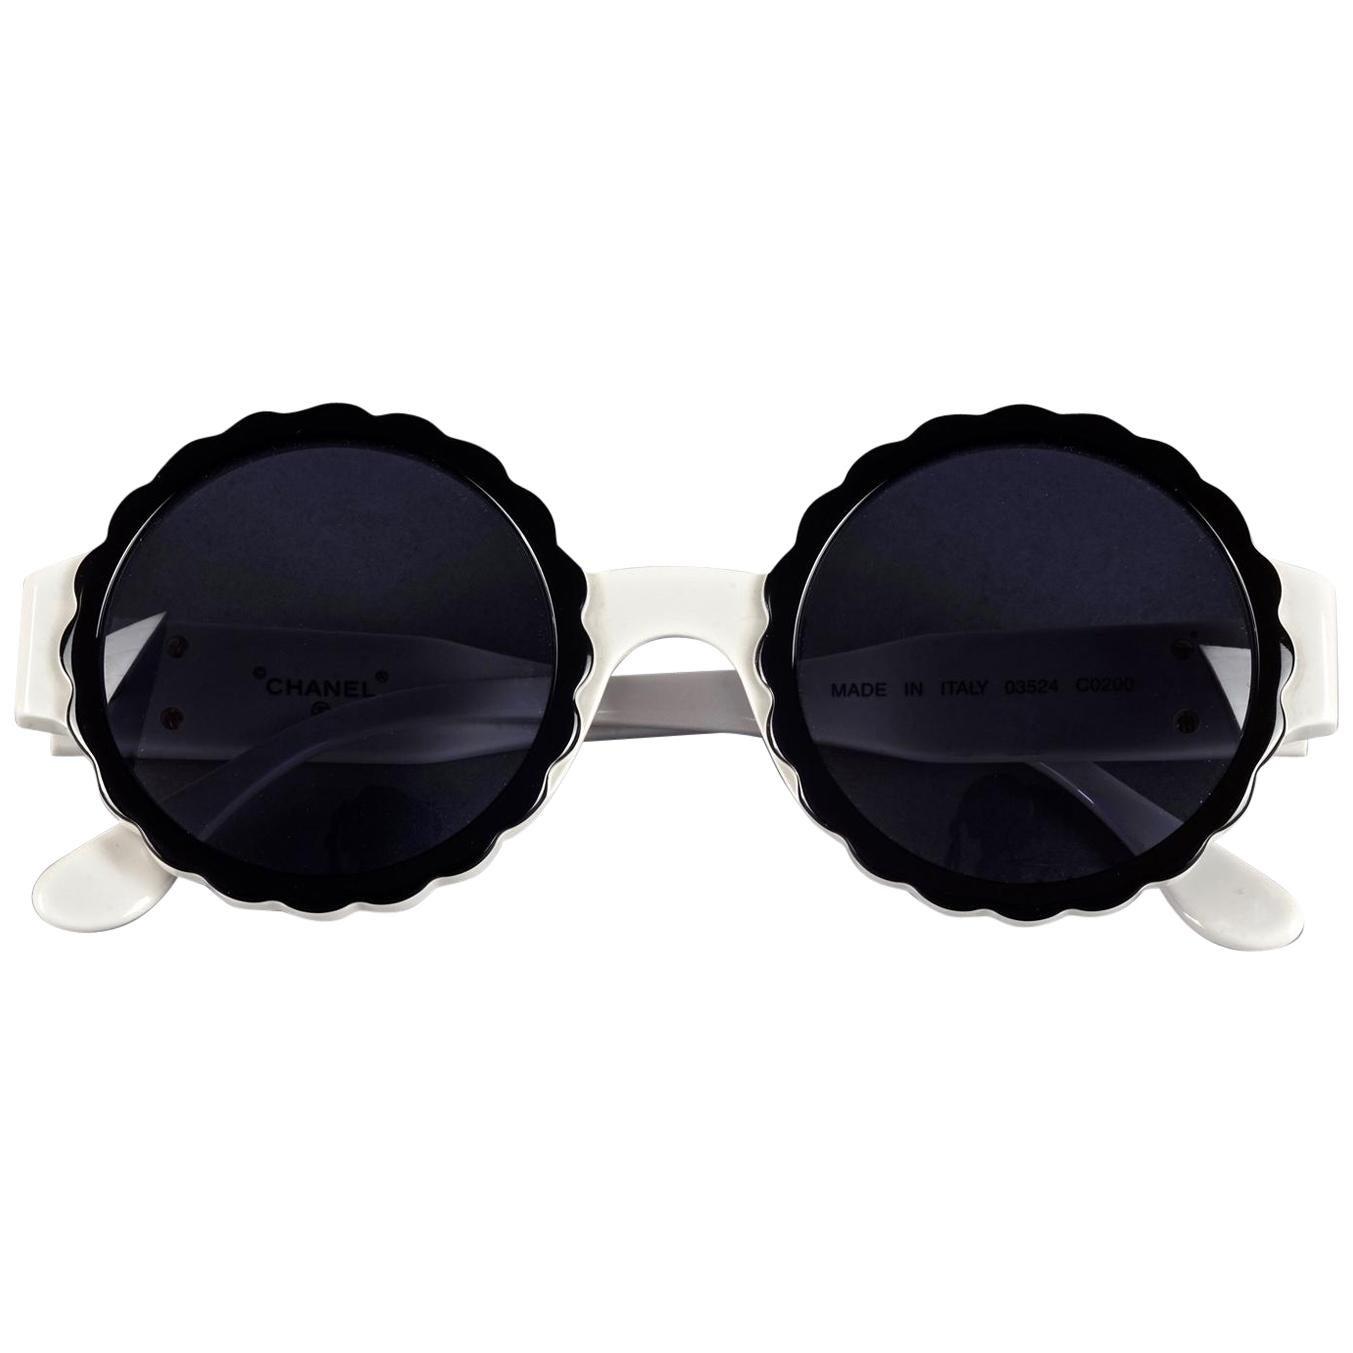 Vintage 1993 Iconic CHANEL PARIS Camellia Round Sunglasses